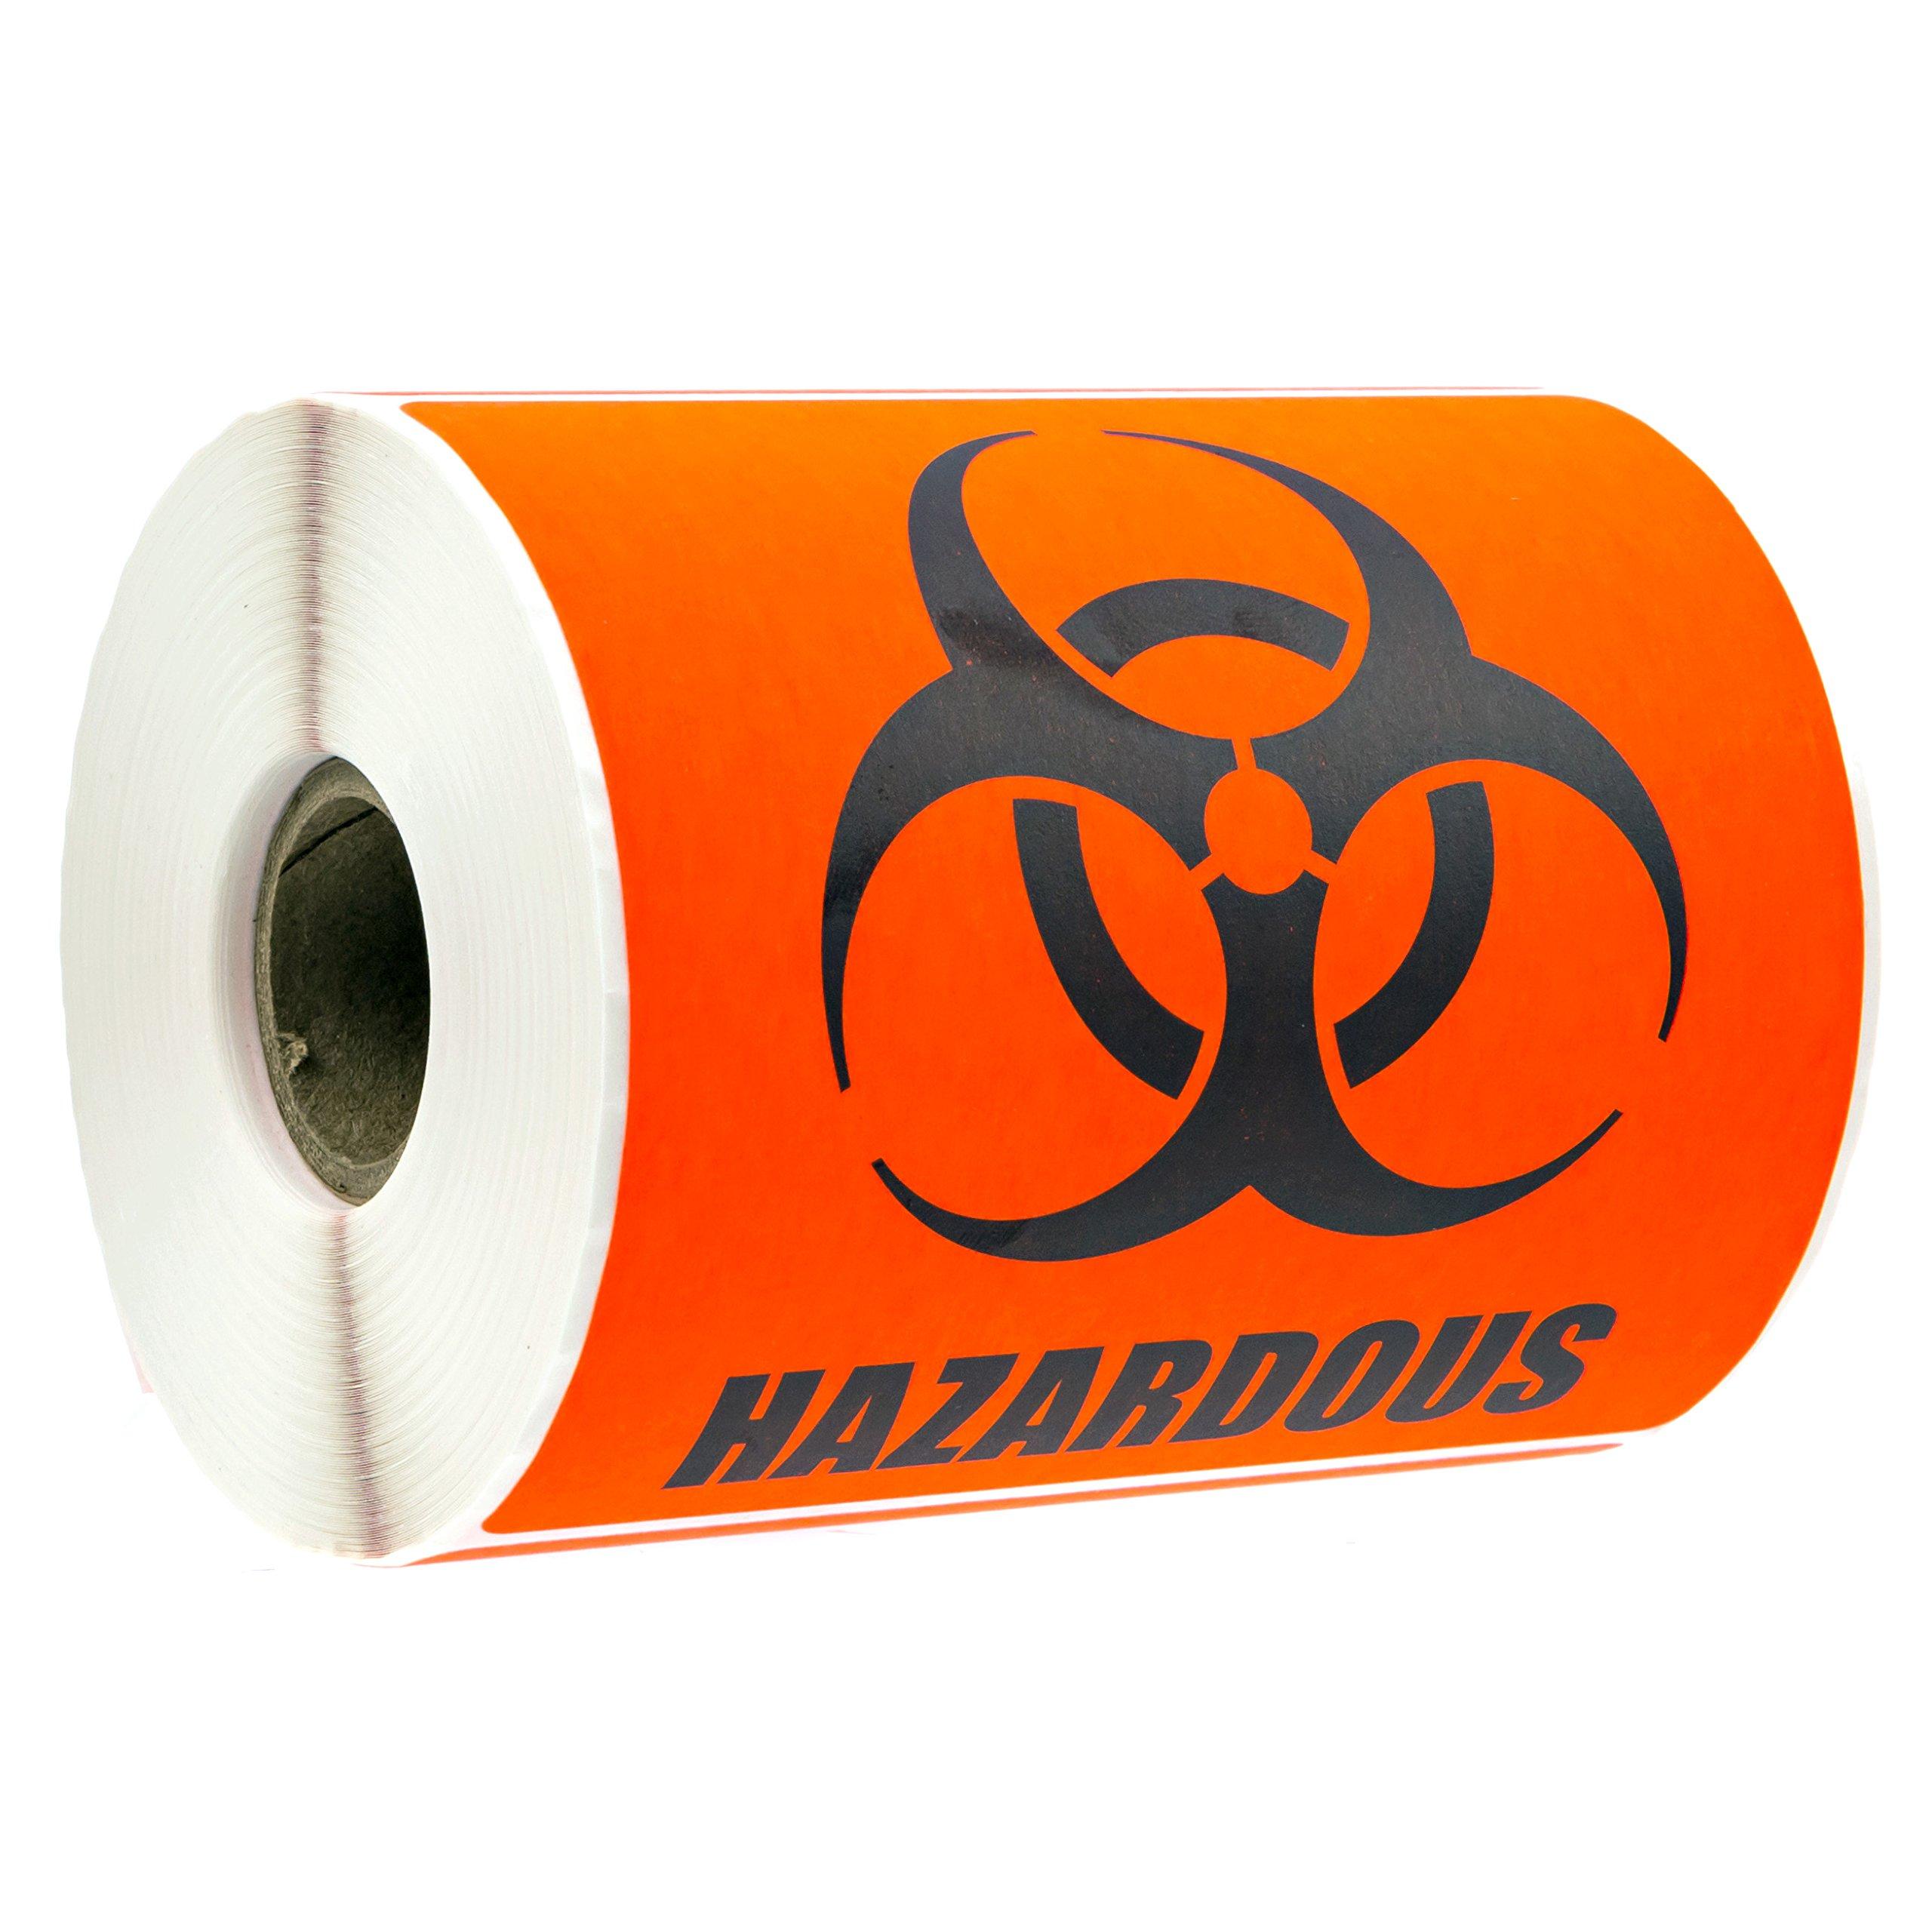 Biohazard Warning Labels/4'' x 4'' Hazardous Materials Warning Stickers